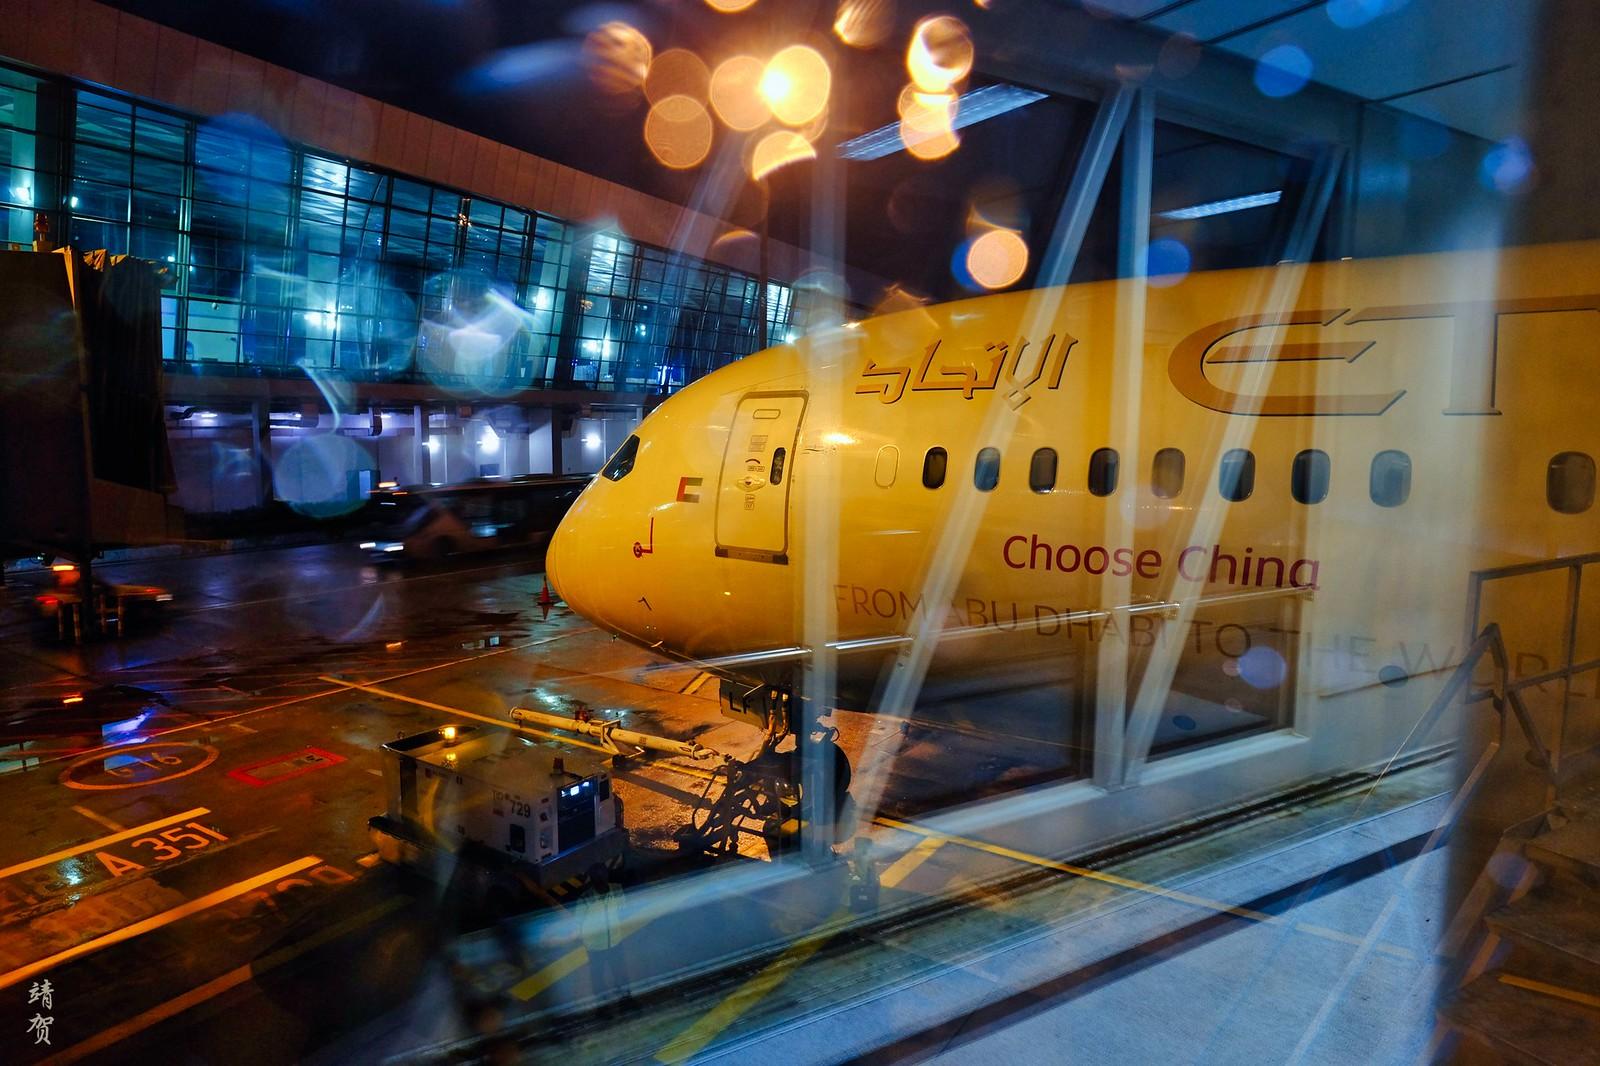 Boarding Etihad's 787